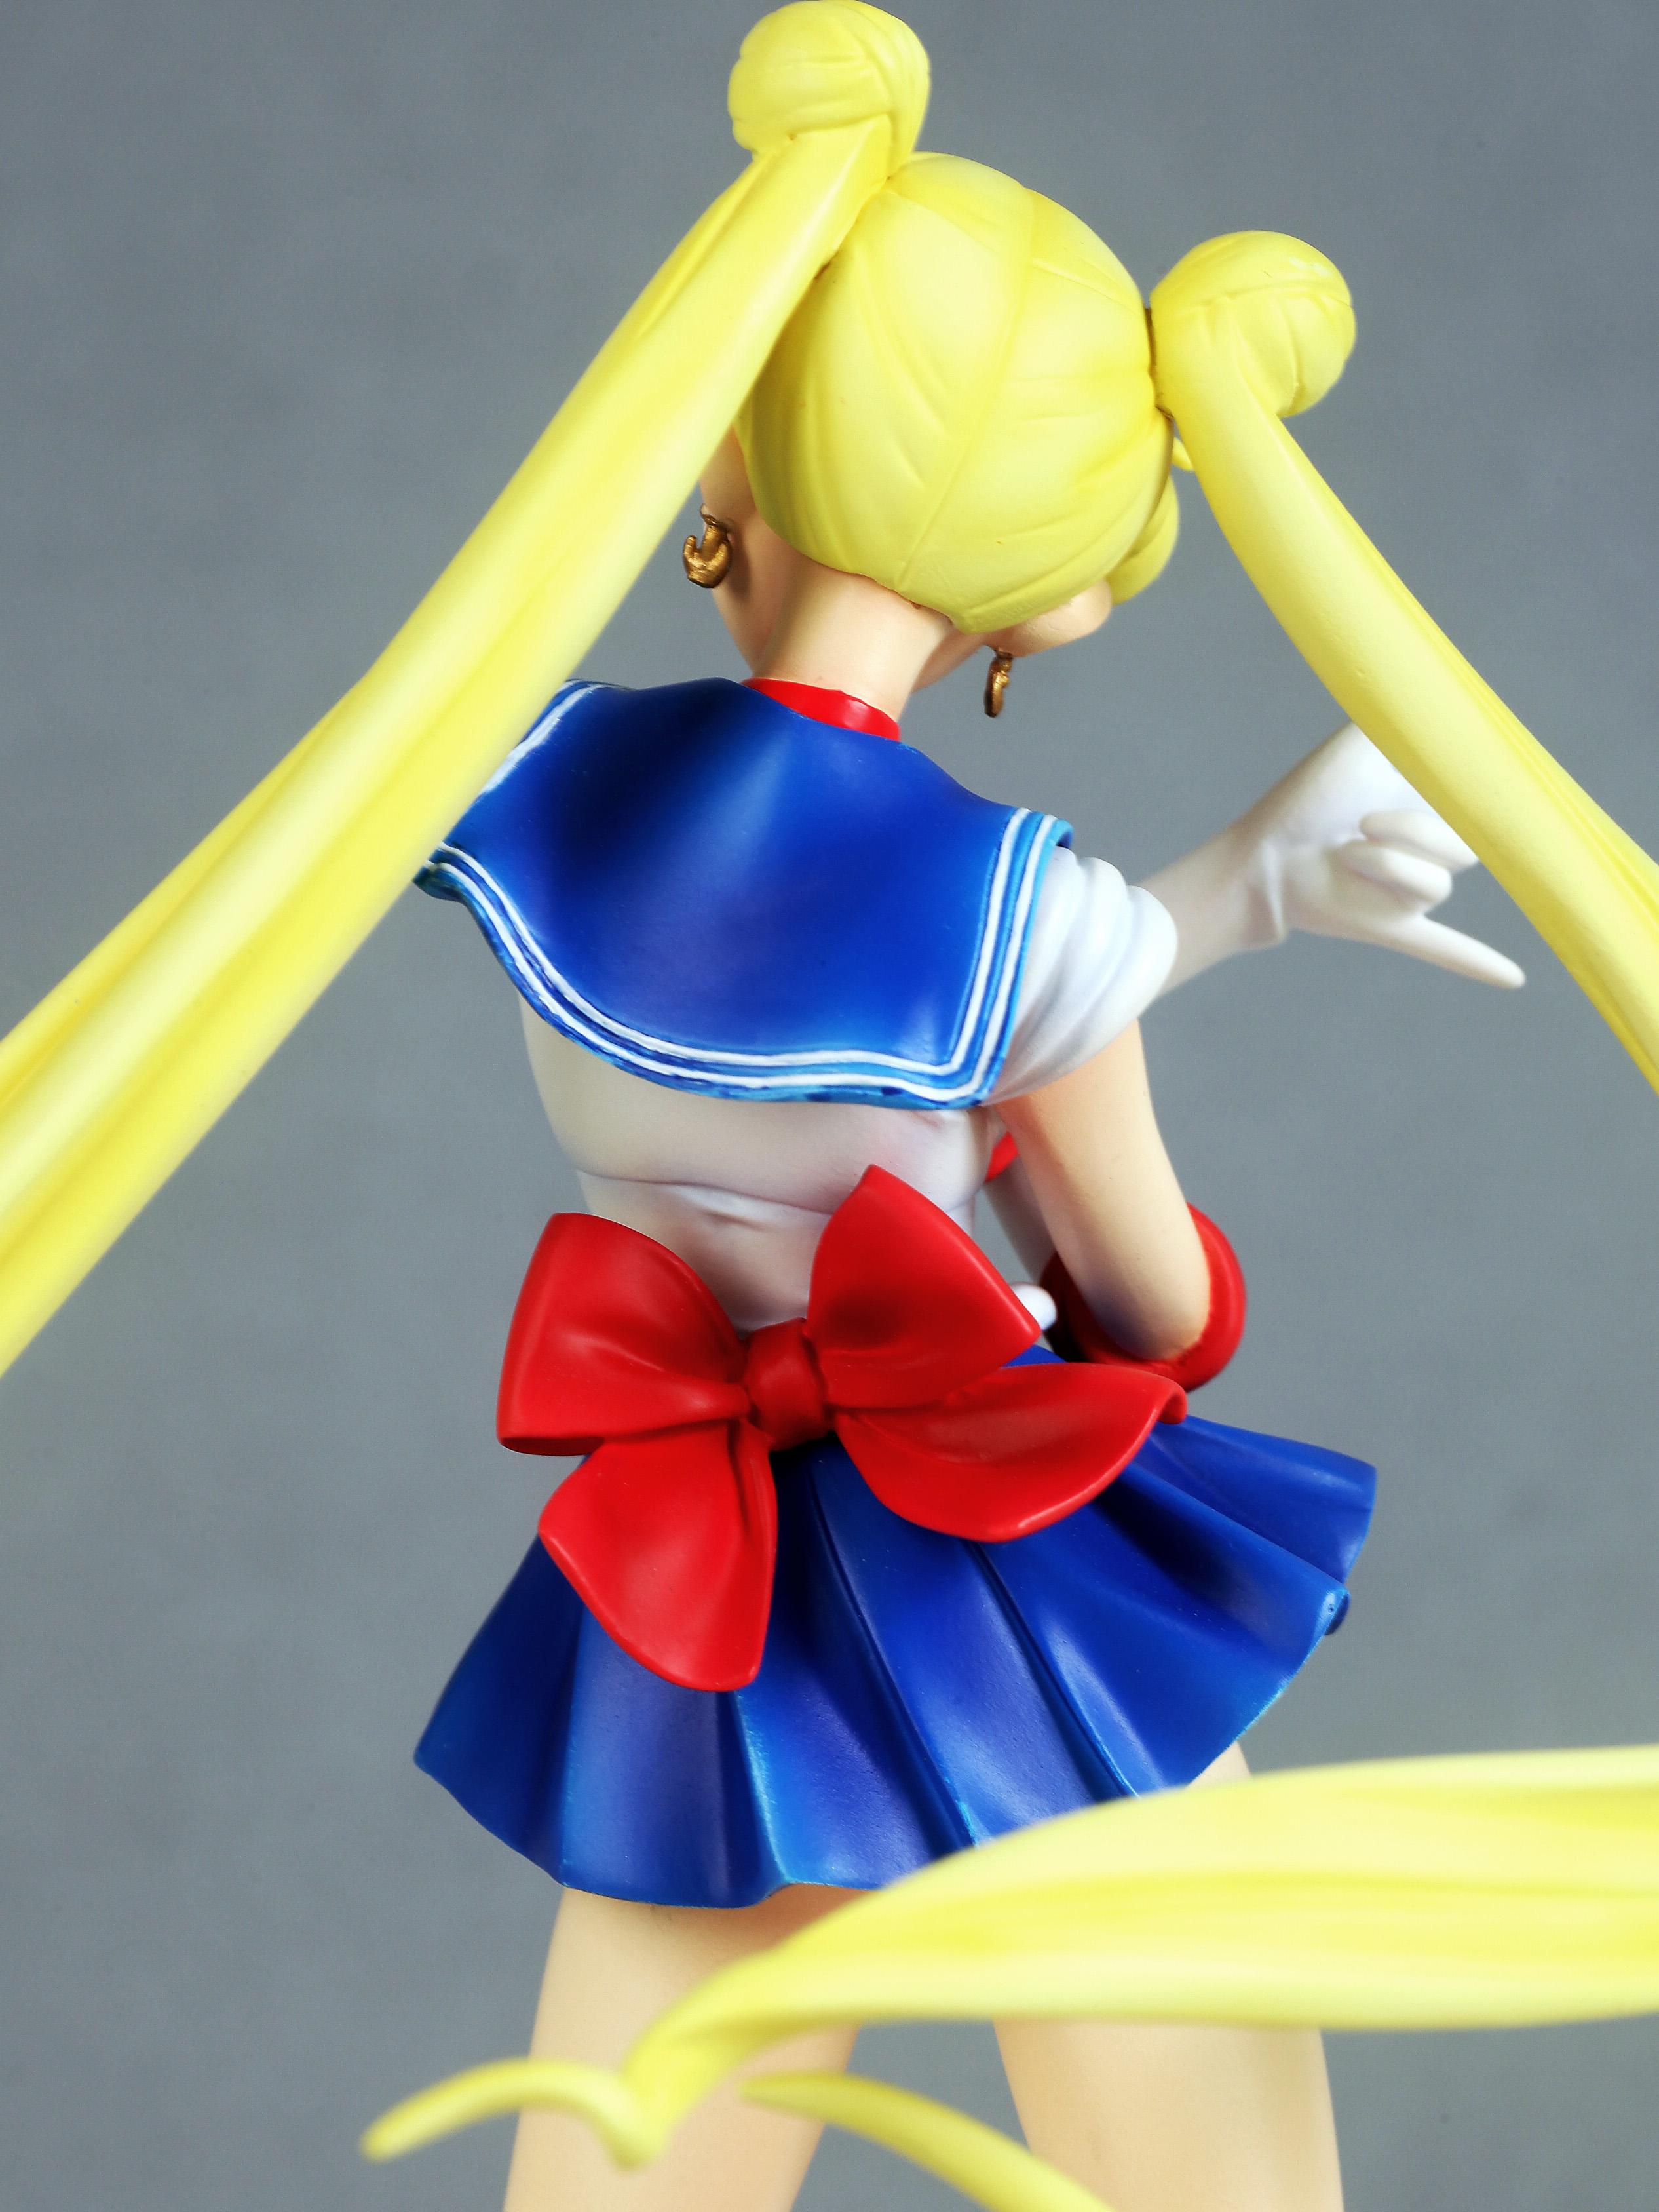 Sailor Moon Usagi Tsukino prepainted figure haruhichan.com Sailor Moon Anime figure 07